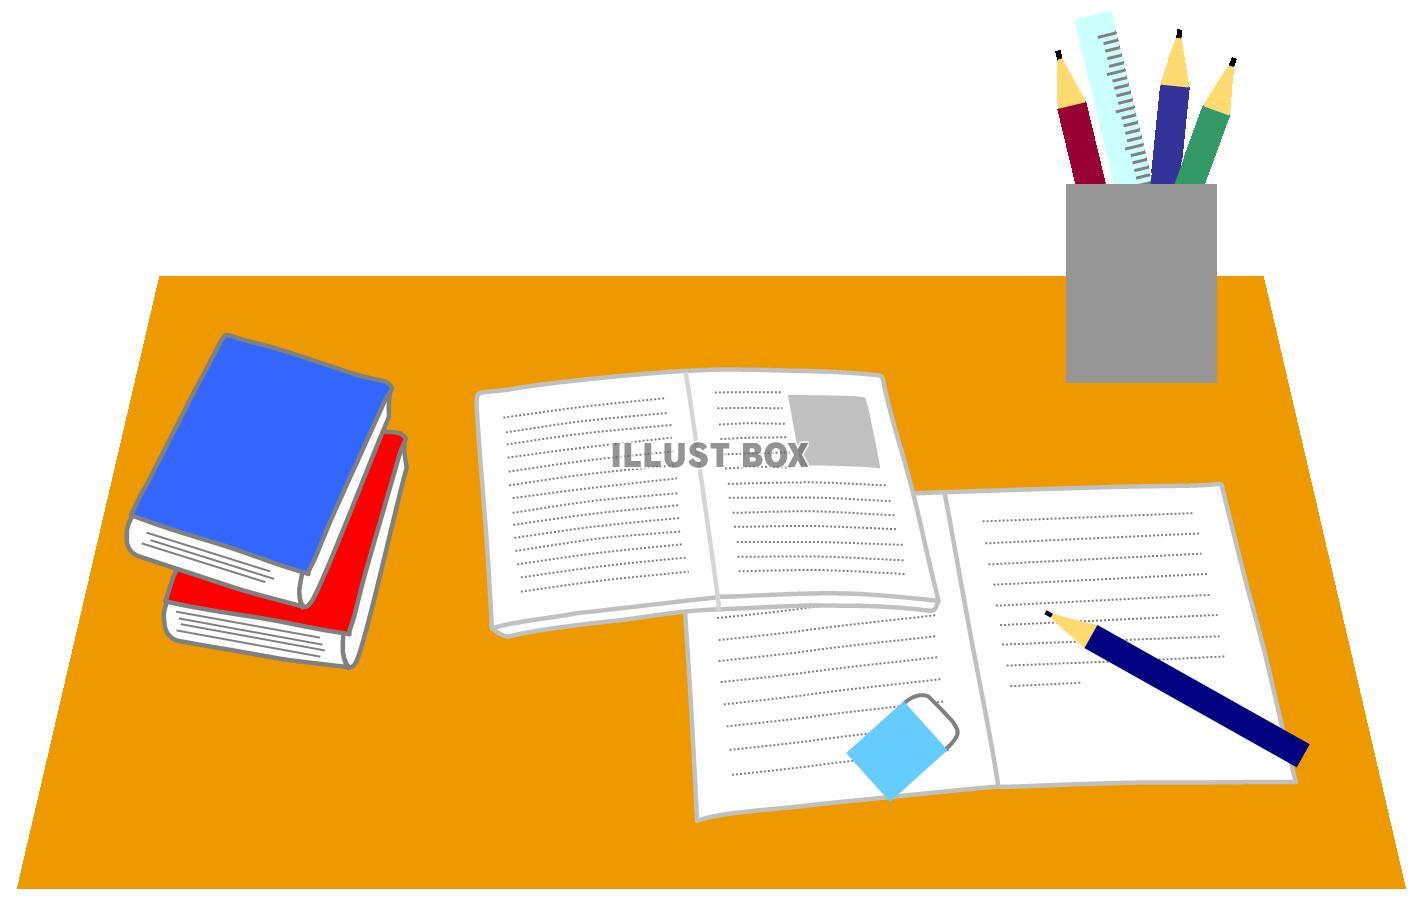 無料イラスト 勉強机 受験学習自主勉強宿題文房具